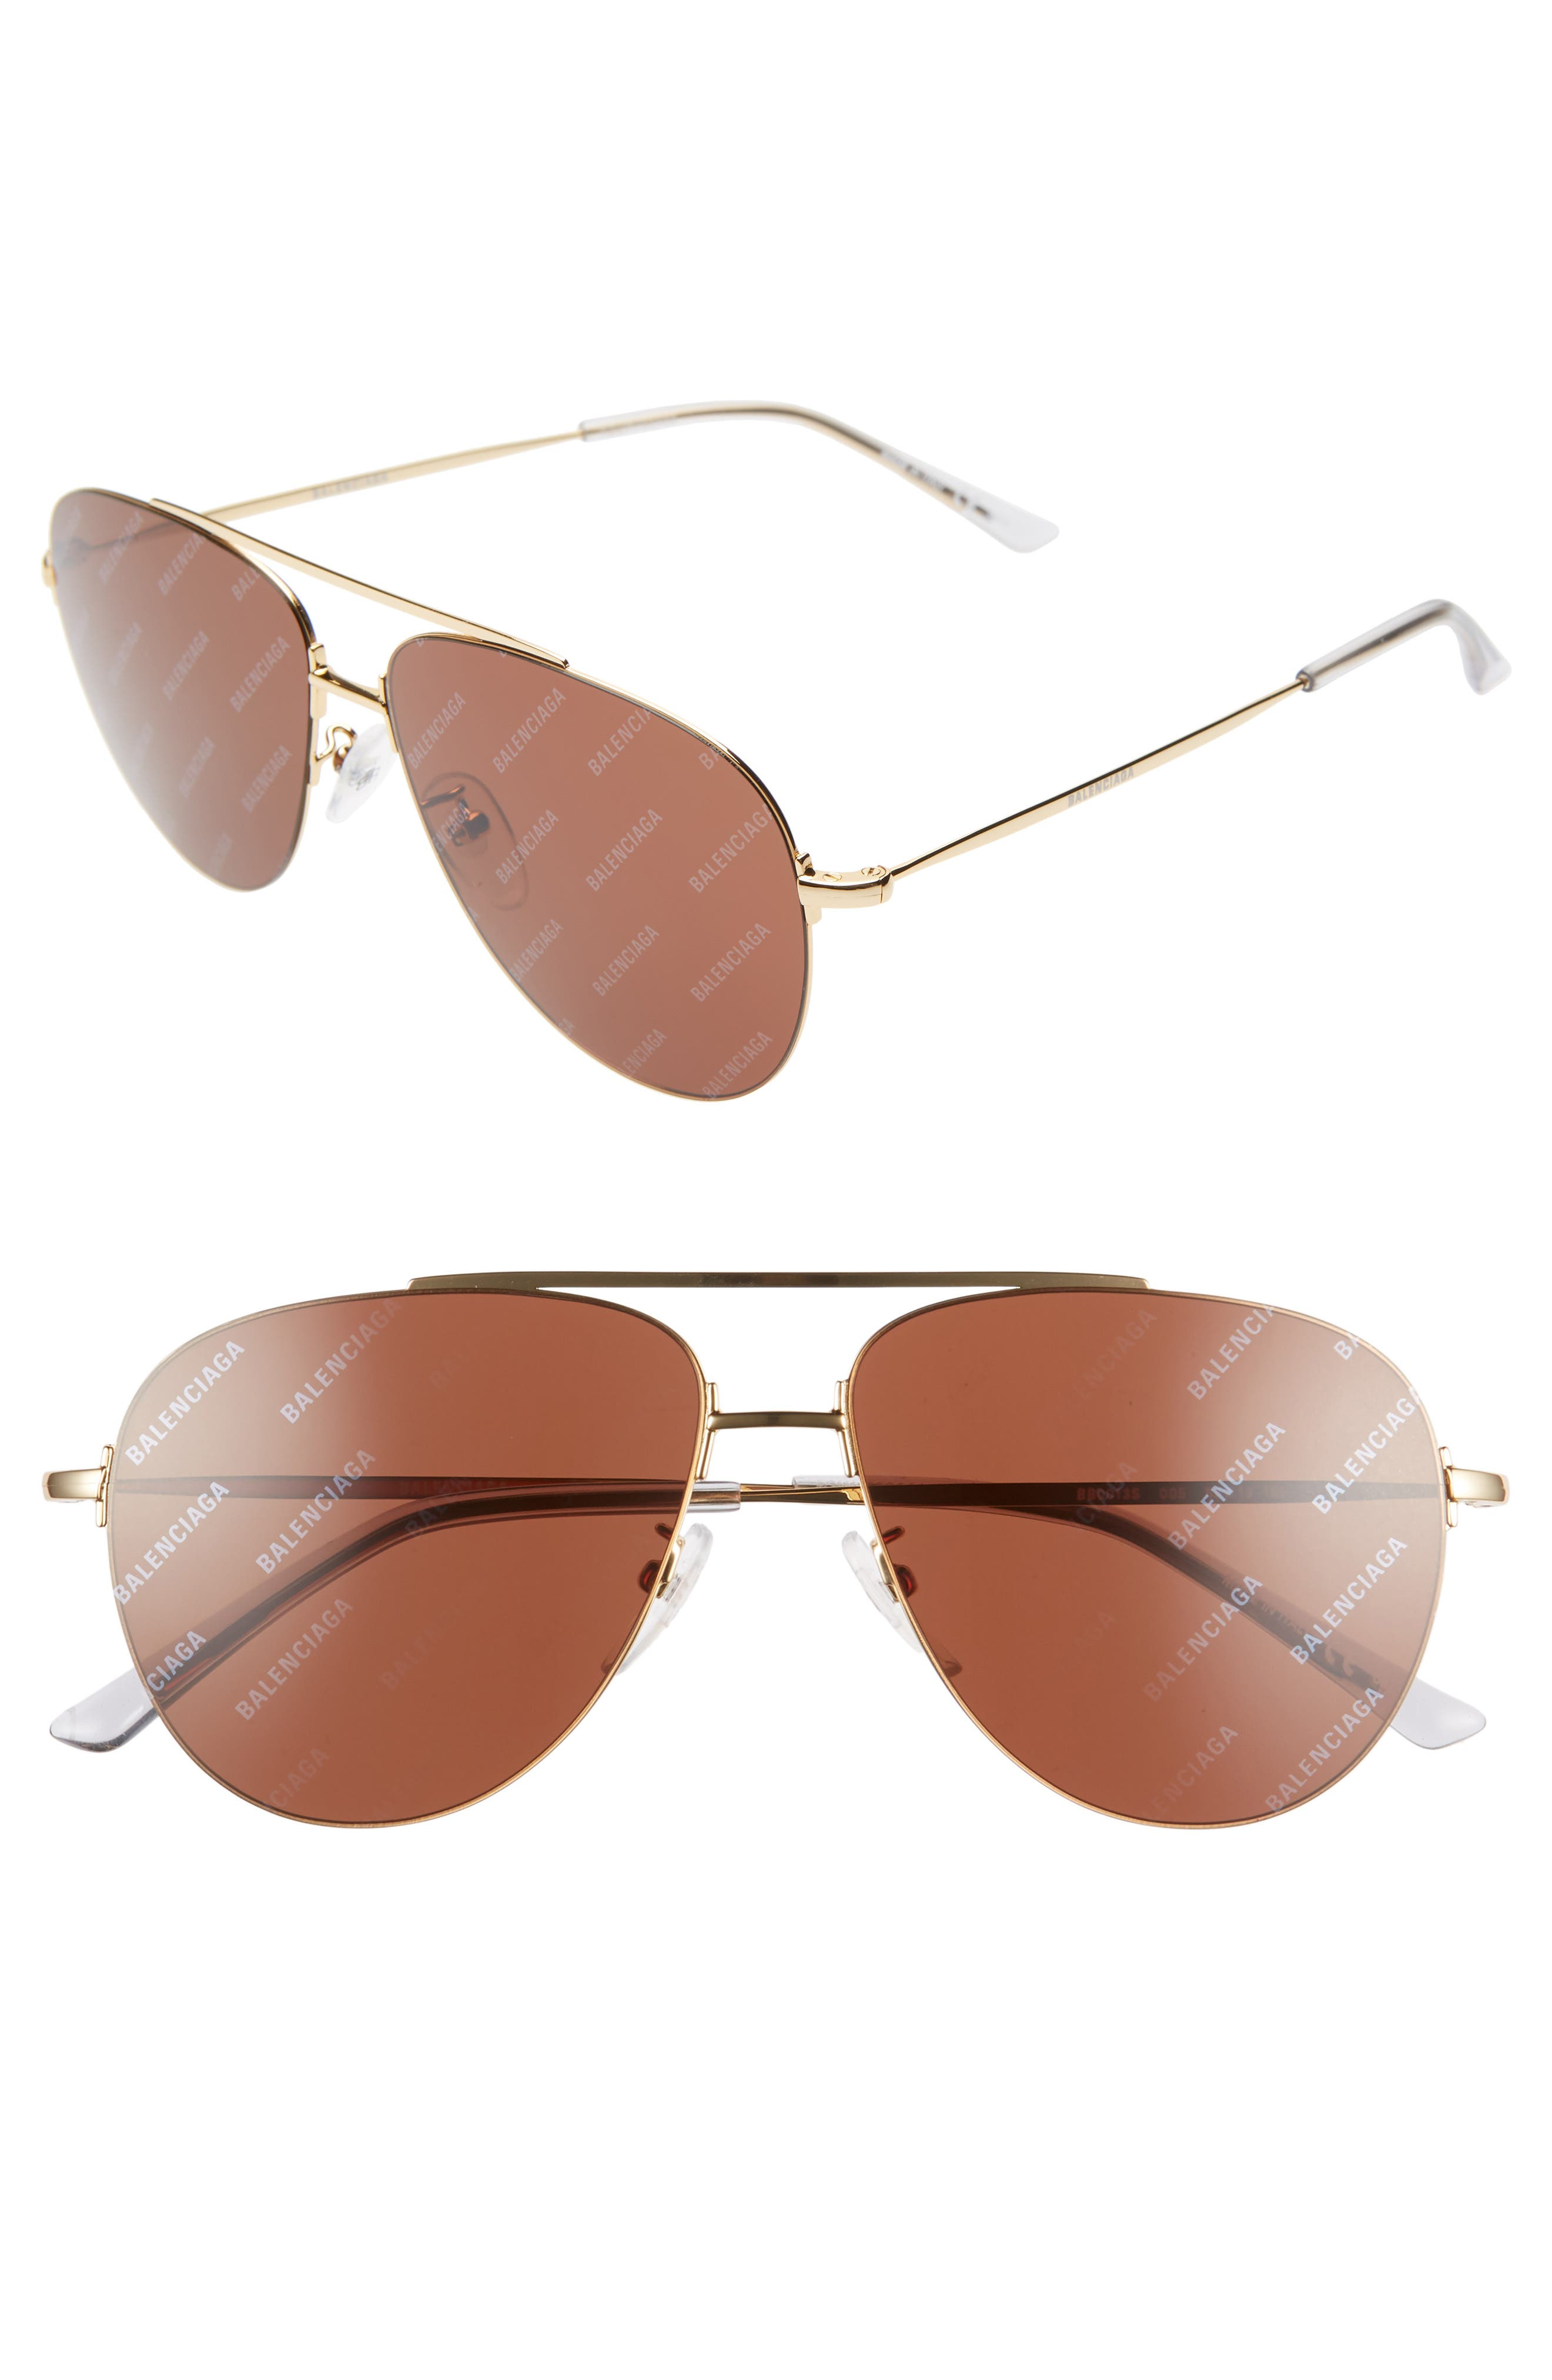 Balenciaga 5m Aviator Sunglasses - Shiny Endura Gold/ Brown